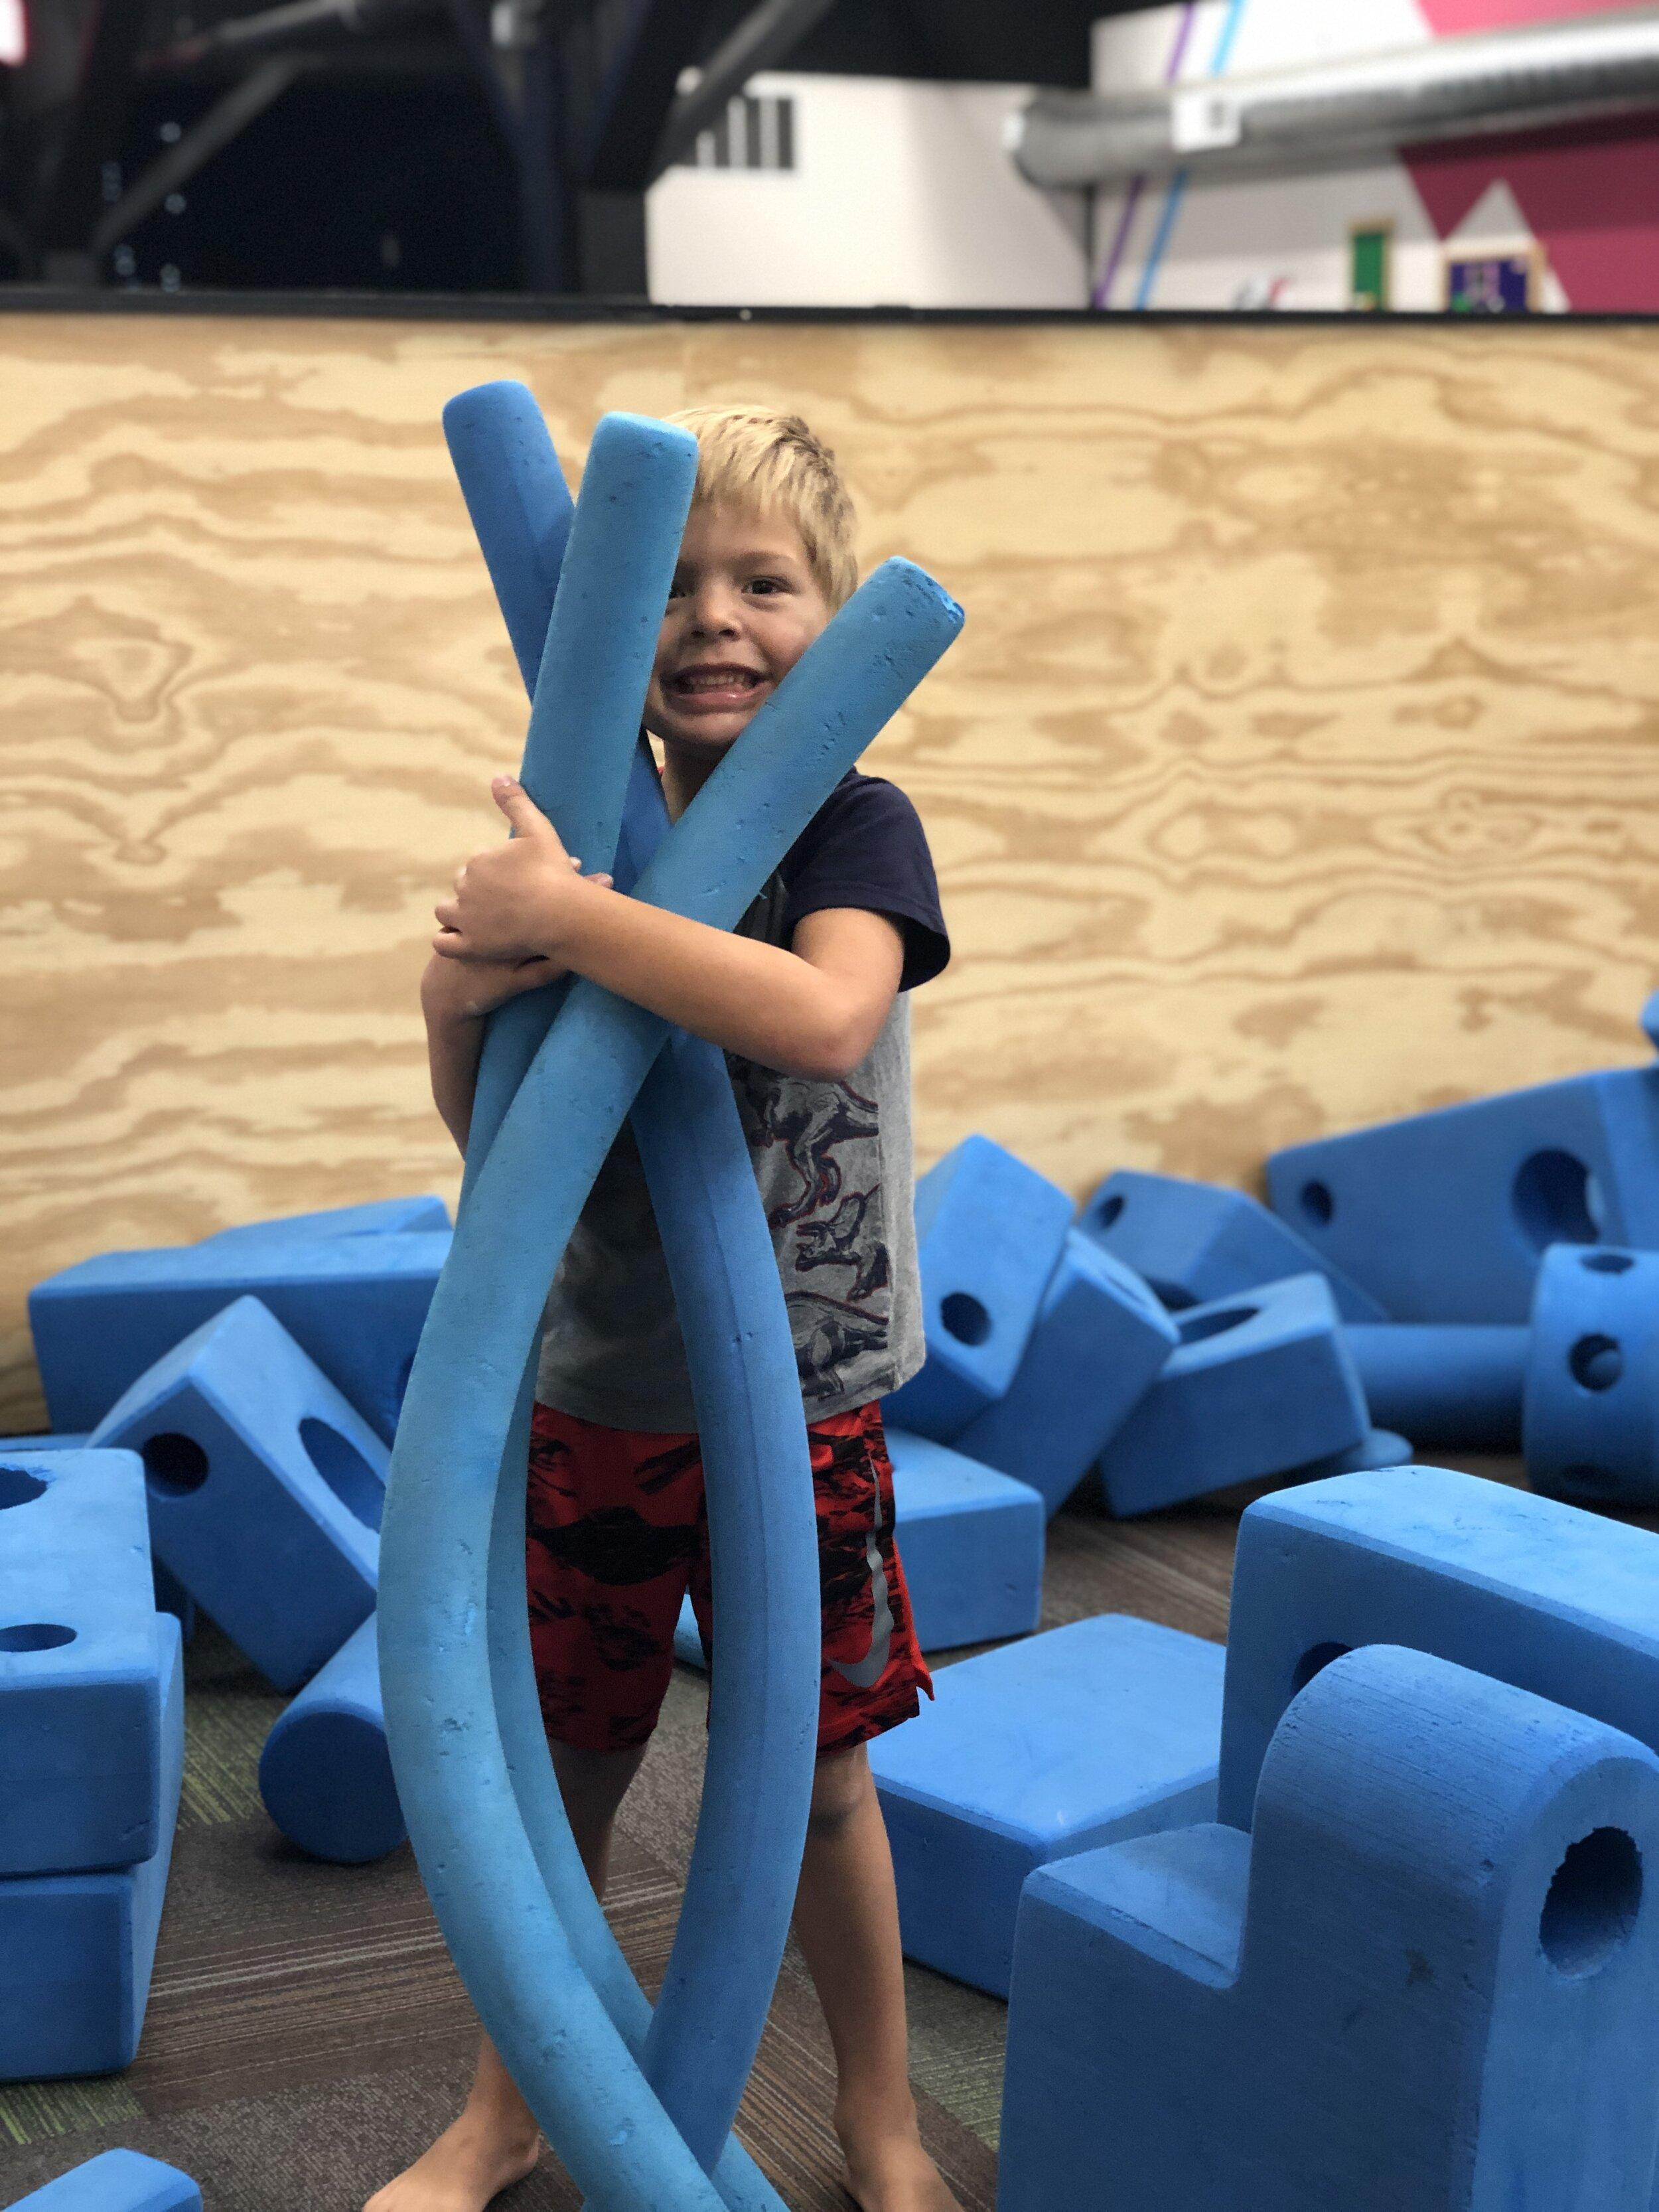 Camden enjoying the giant foam blocks